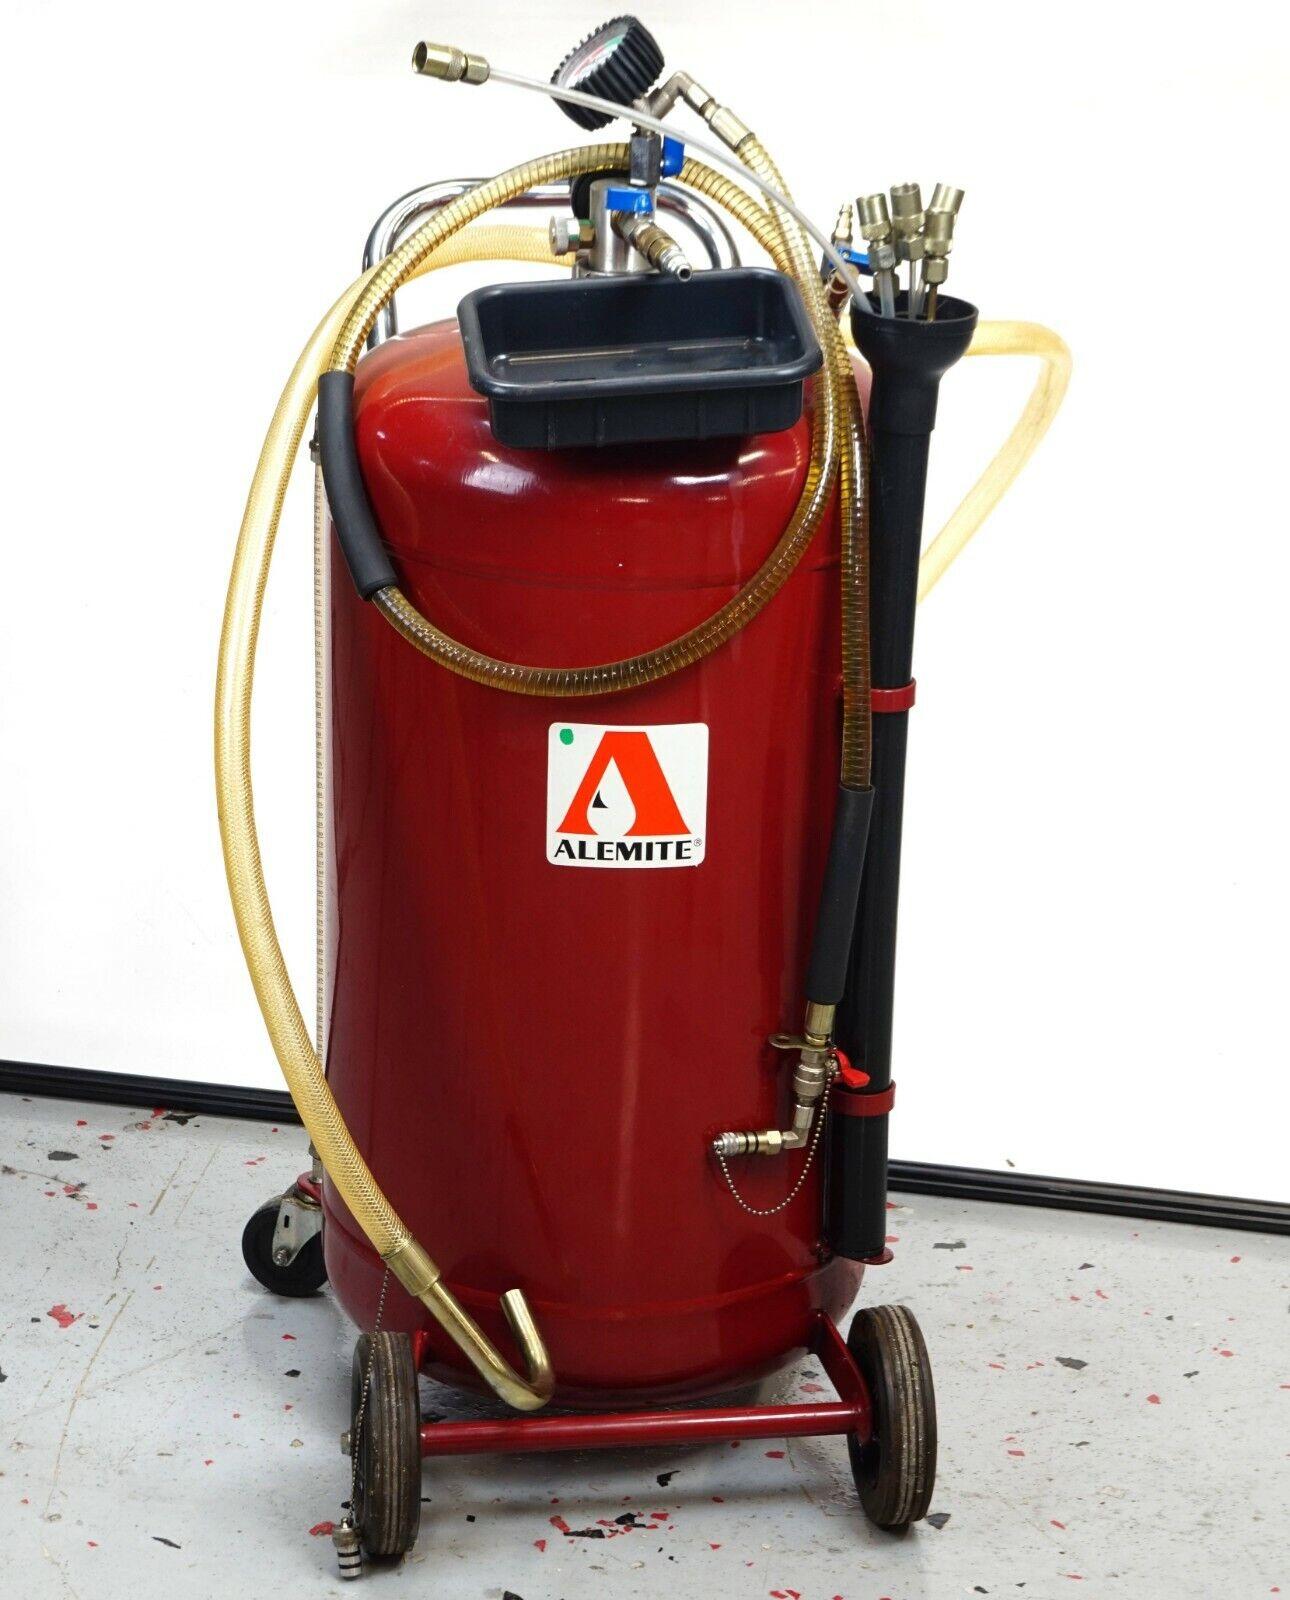 Alemite 8588 Air Pressure